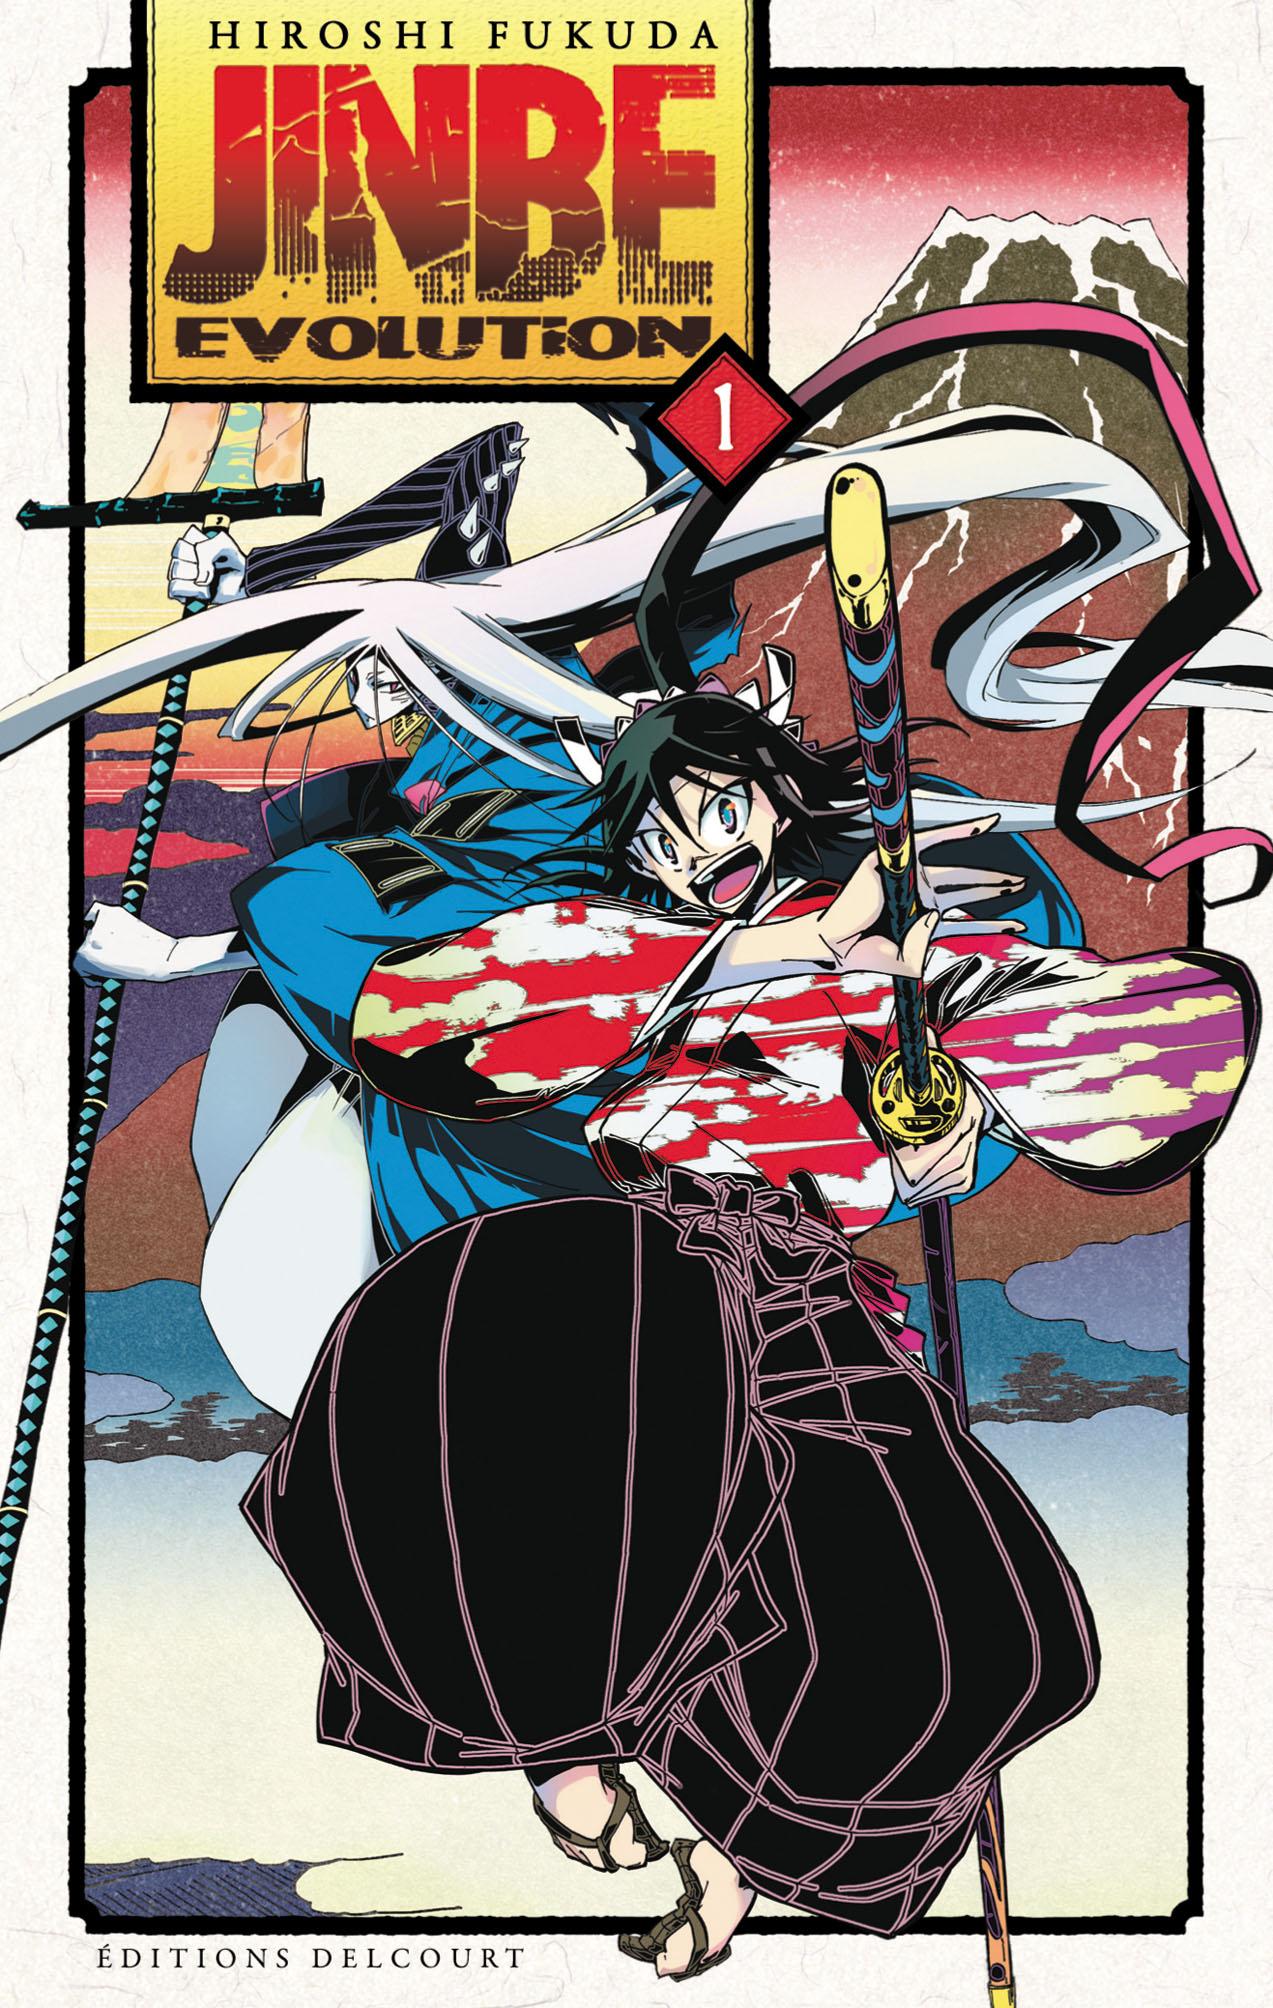 http://img.manga-sanctuary.com/big/jinbe-evolution-manga-volume-1-simple-60856.jpg